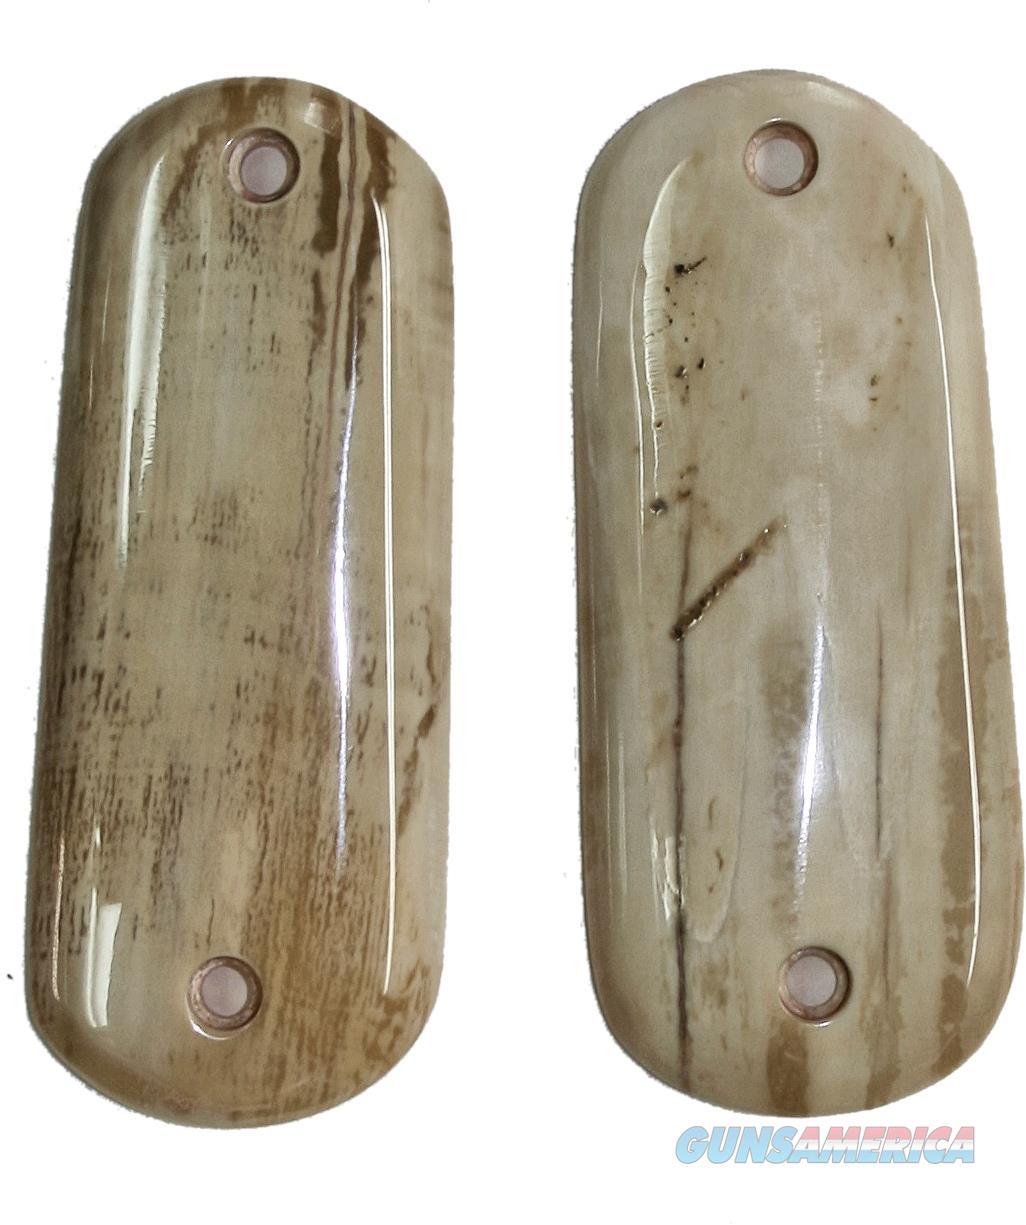 Colt 1902 Hammer Auto Fossilized Alaskan Walrus Ivory Grips  Non-Guns > Gun Parts > Grips > Other